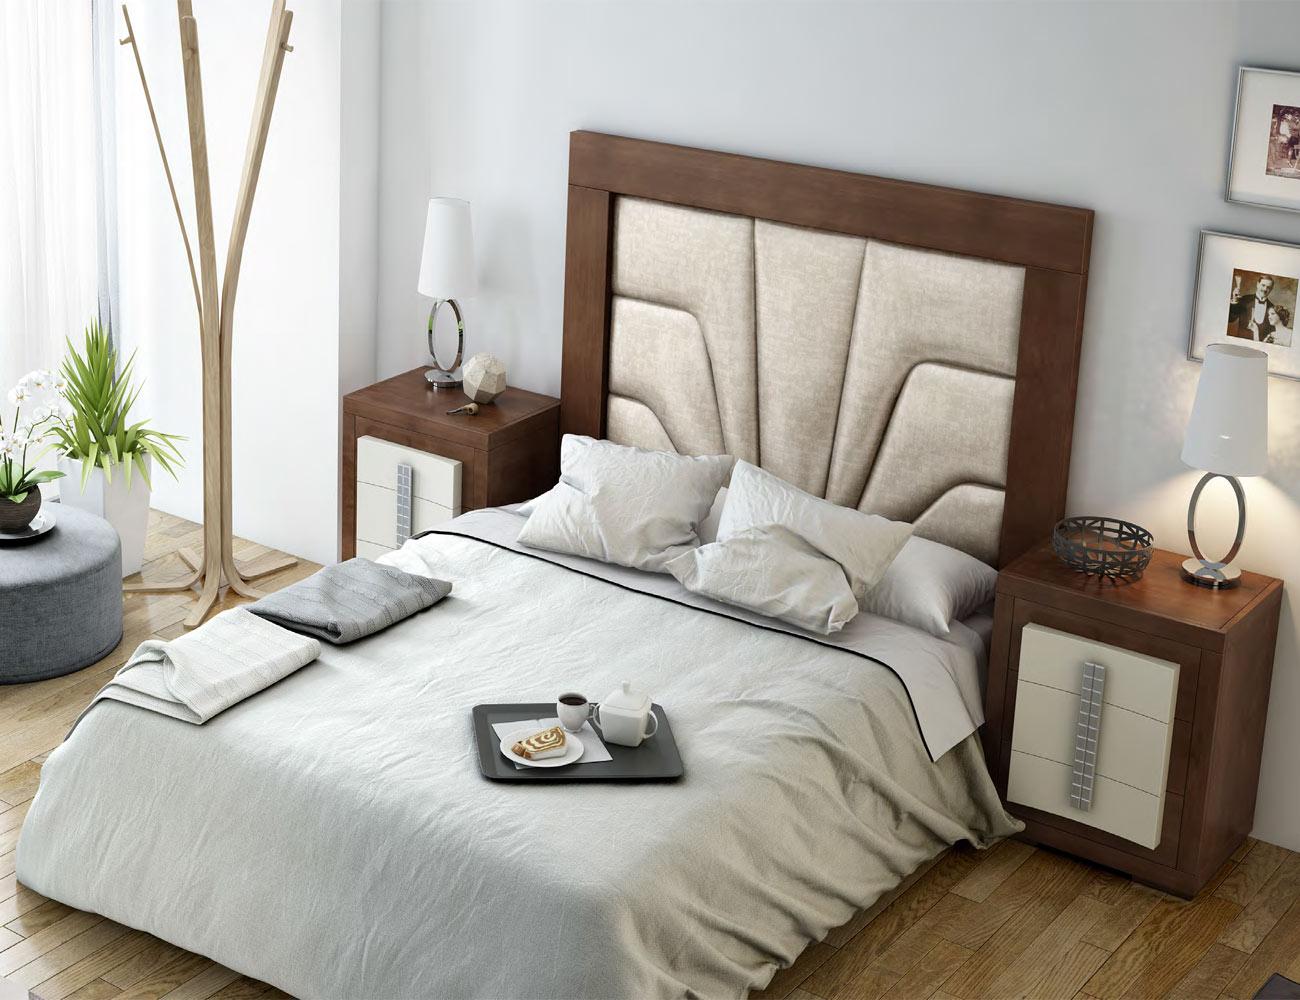 Dorm01 dormitorio matrimonio neoclasico nogal classic cubos caramelo cabecero tapizado1